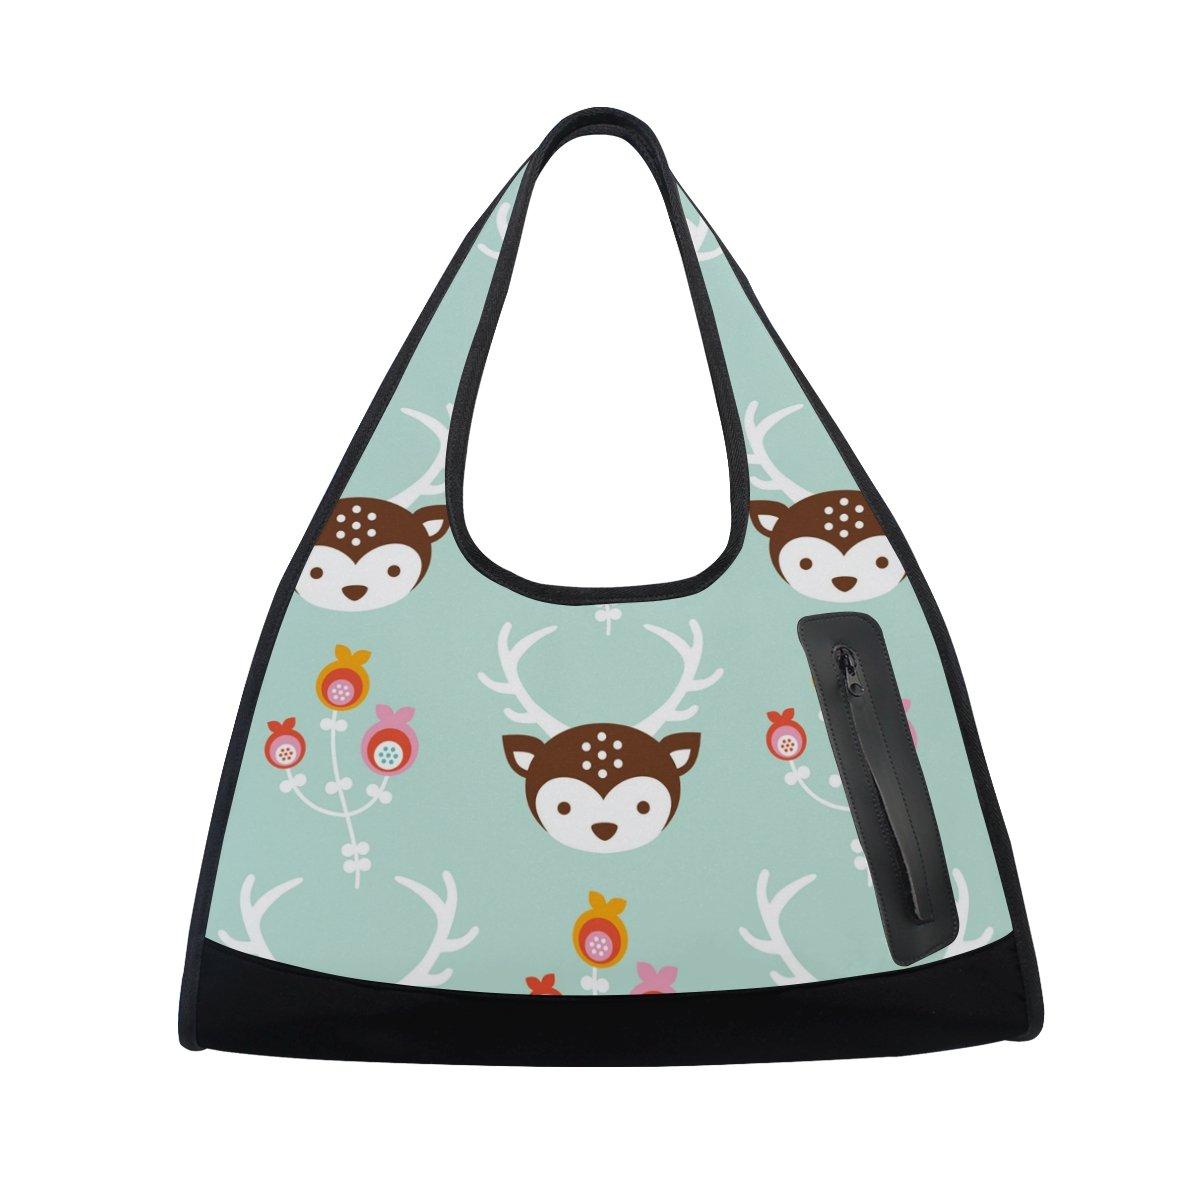 AHOMY Canvas Sports Gym Bag Cartoon Deer Flower Head Travel Shoulder Bag